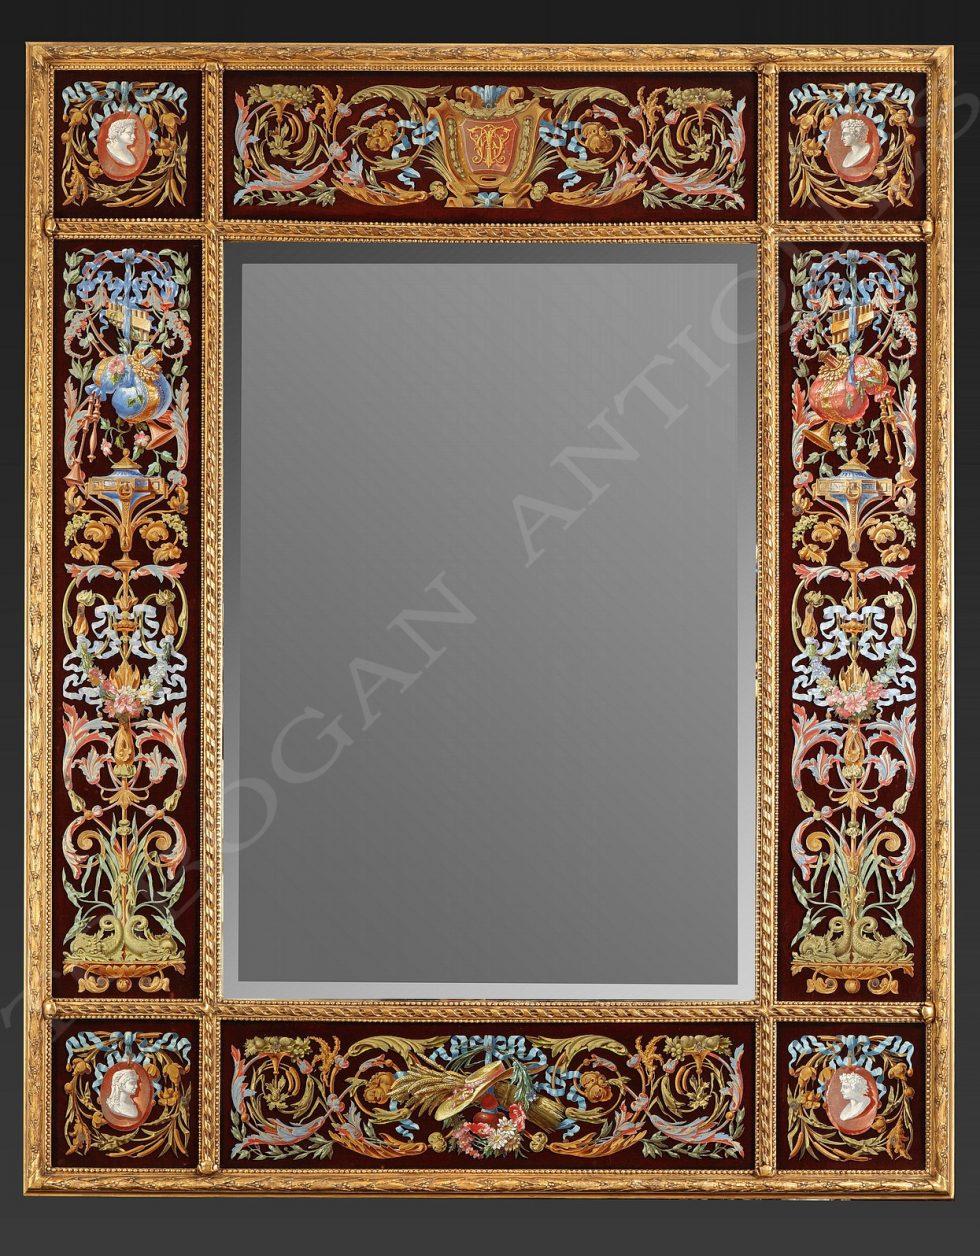 A Splendid Mirror with Rich Polychrome Ornaments